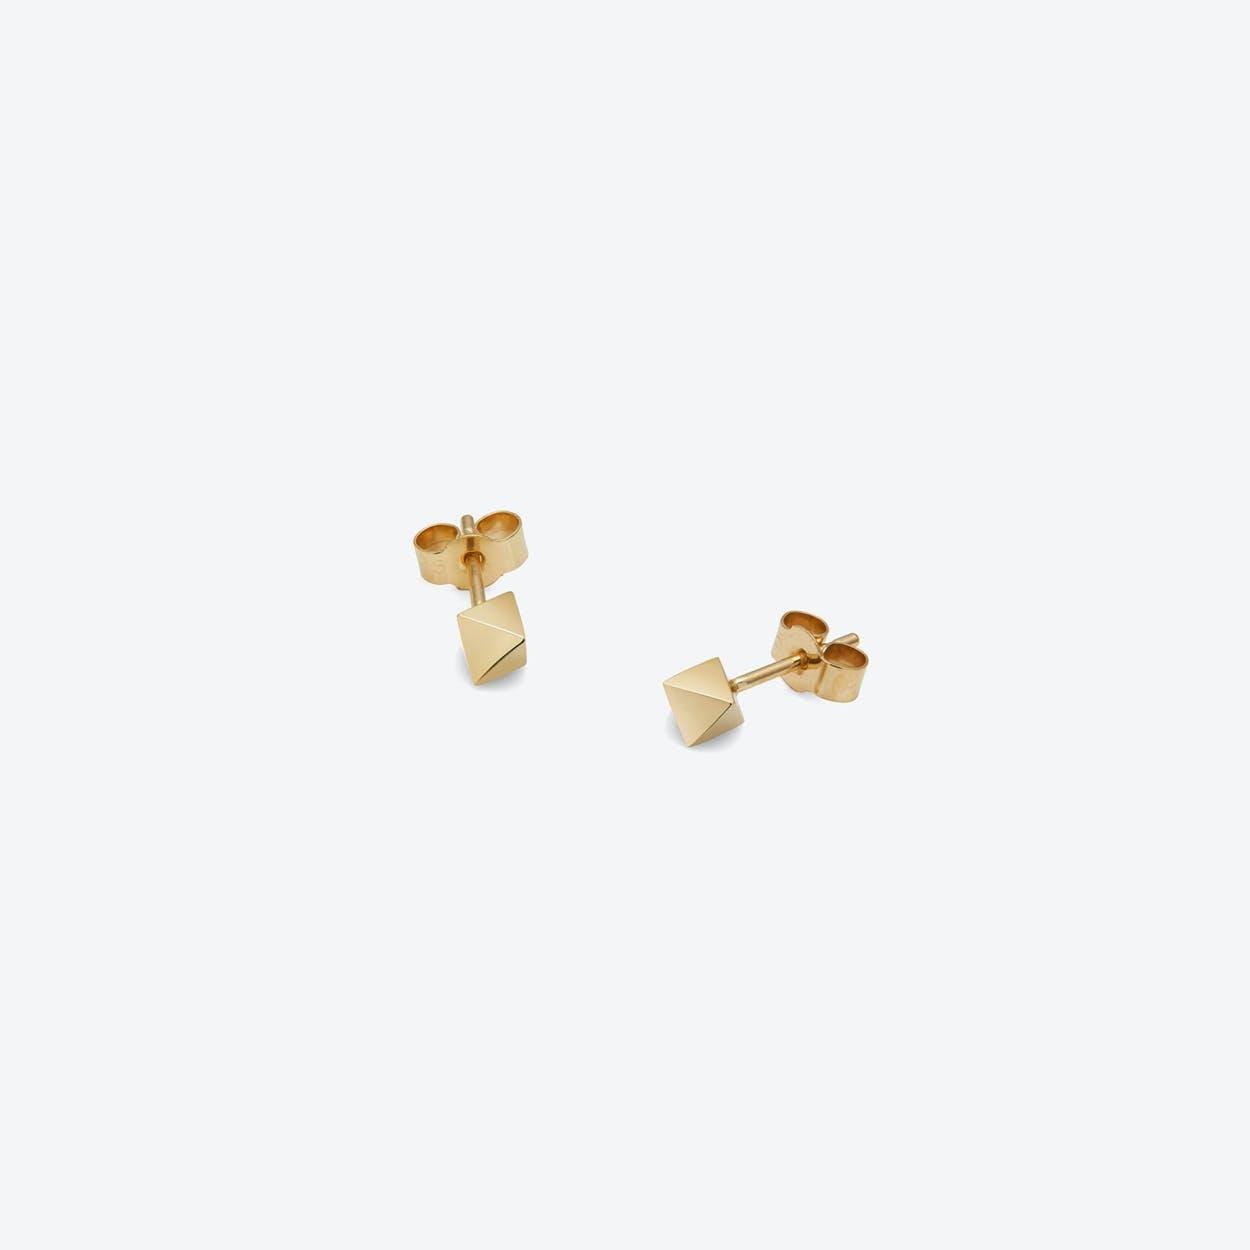 Octahedron Stud Earrings in Gold